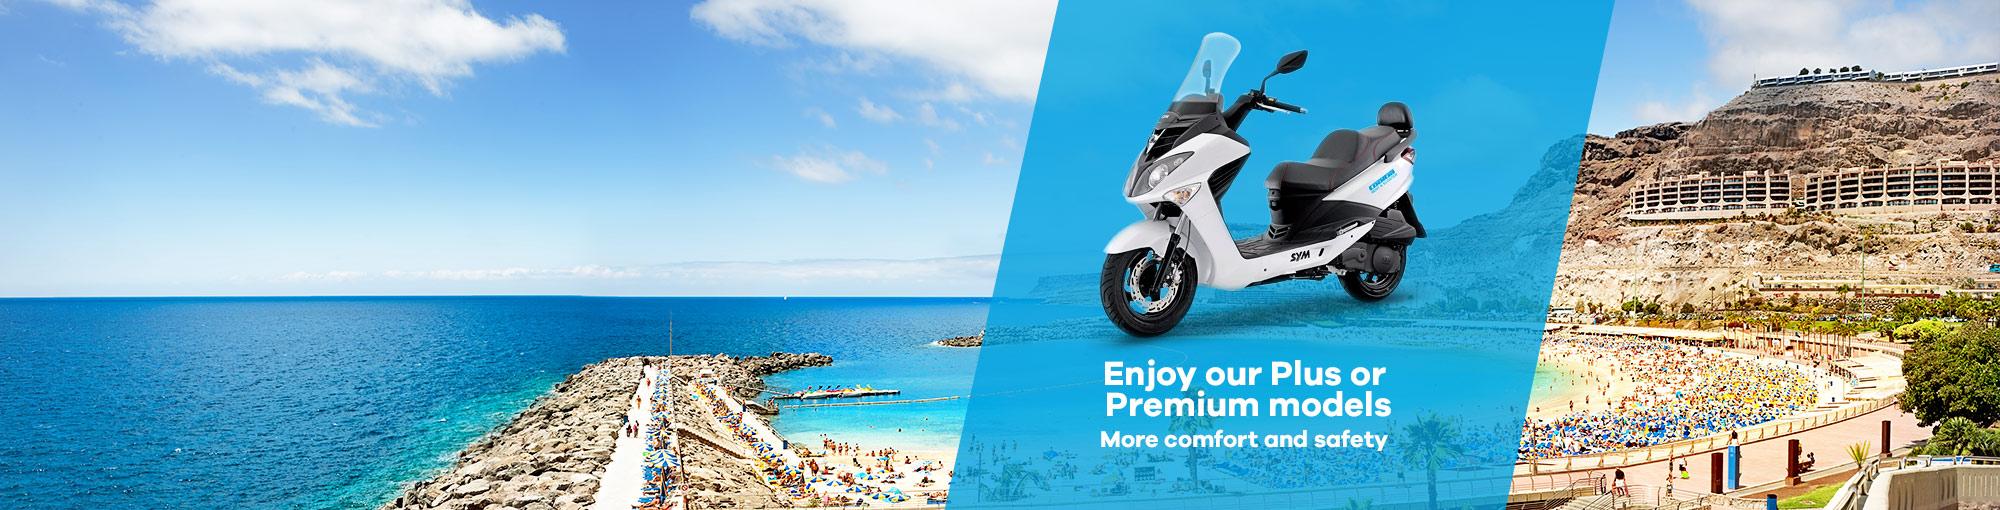 motorcycle rental plus and premium